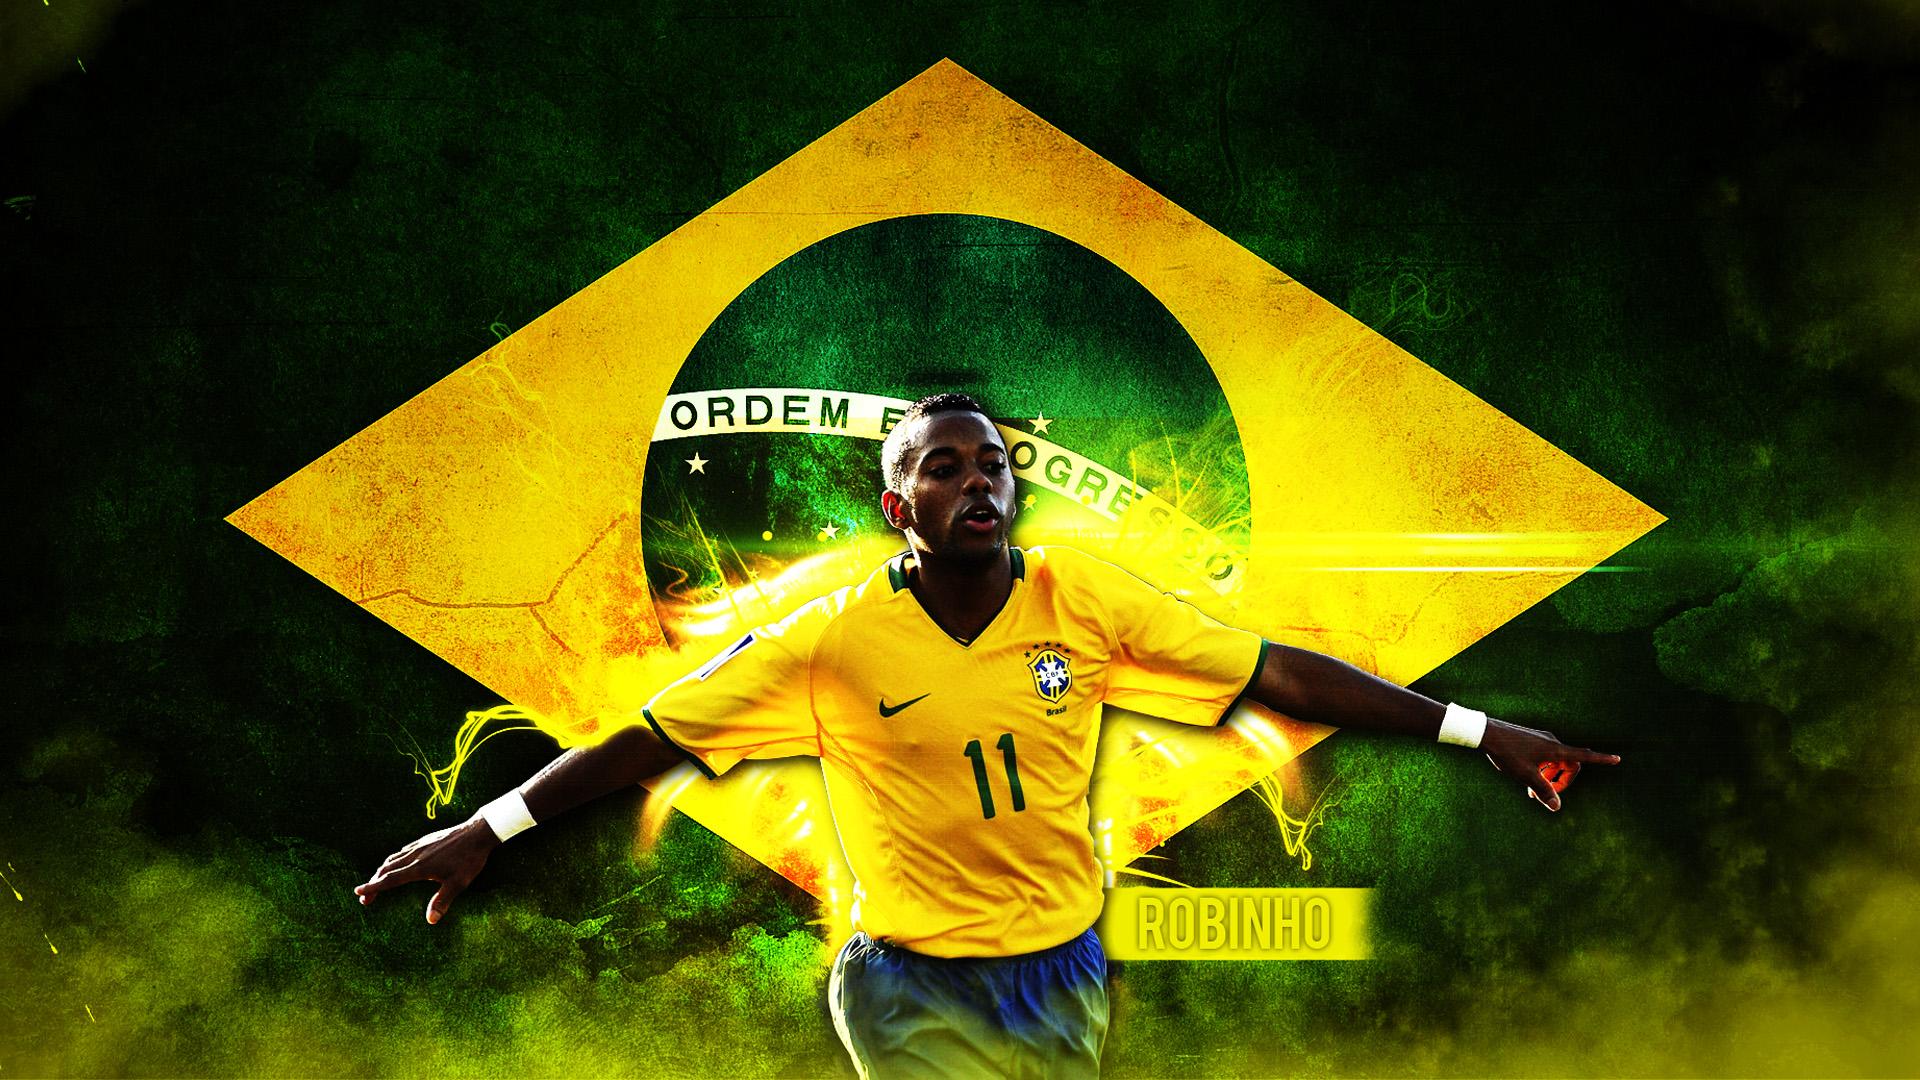 brazil soccer wallpaper 1920x1080jpg 1920x1080